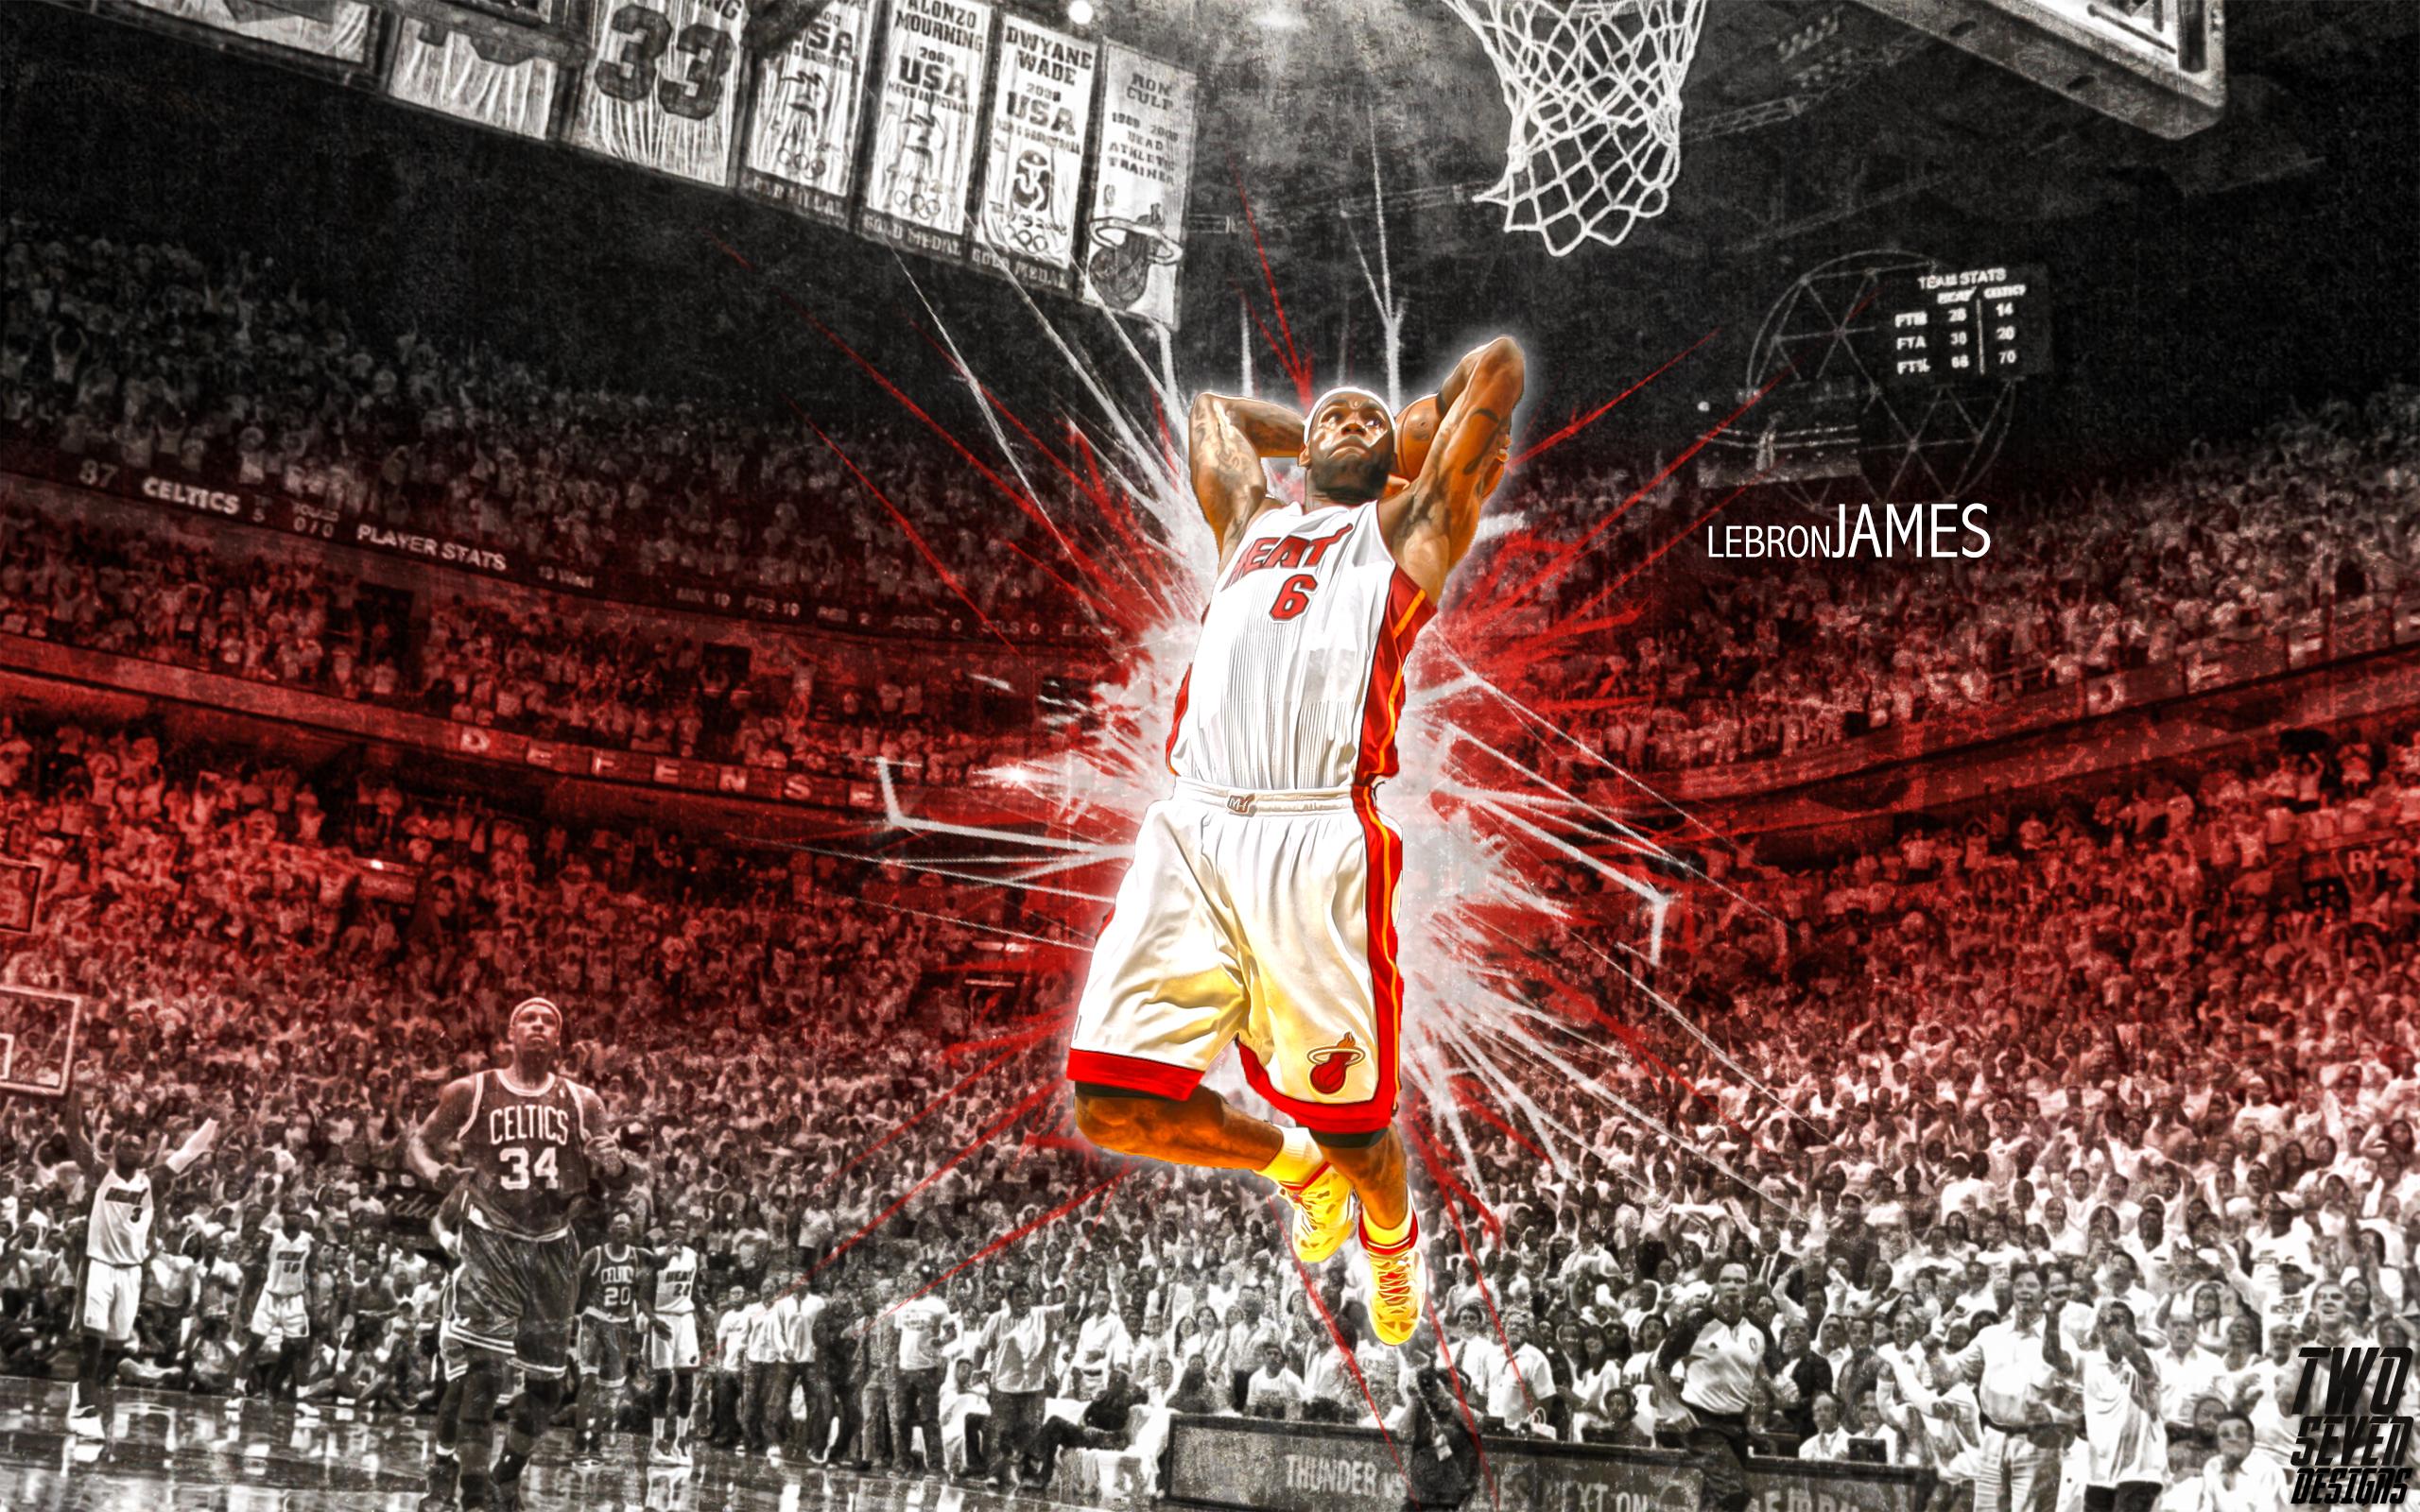 Lebron James Miami Heat Wallpaper For Desktop 5920 Wallpaper Cool 2560x1600